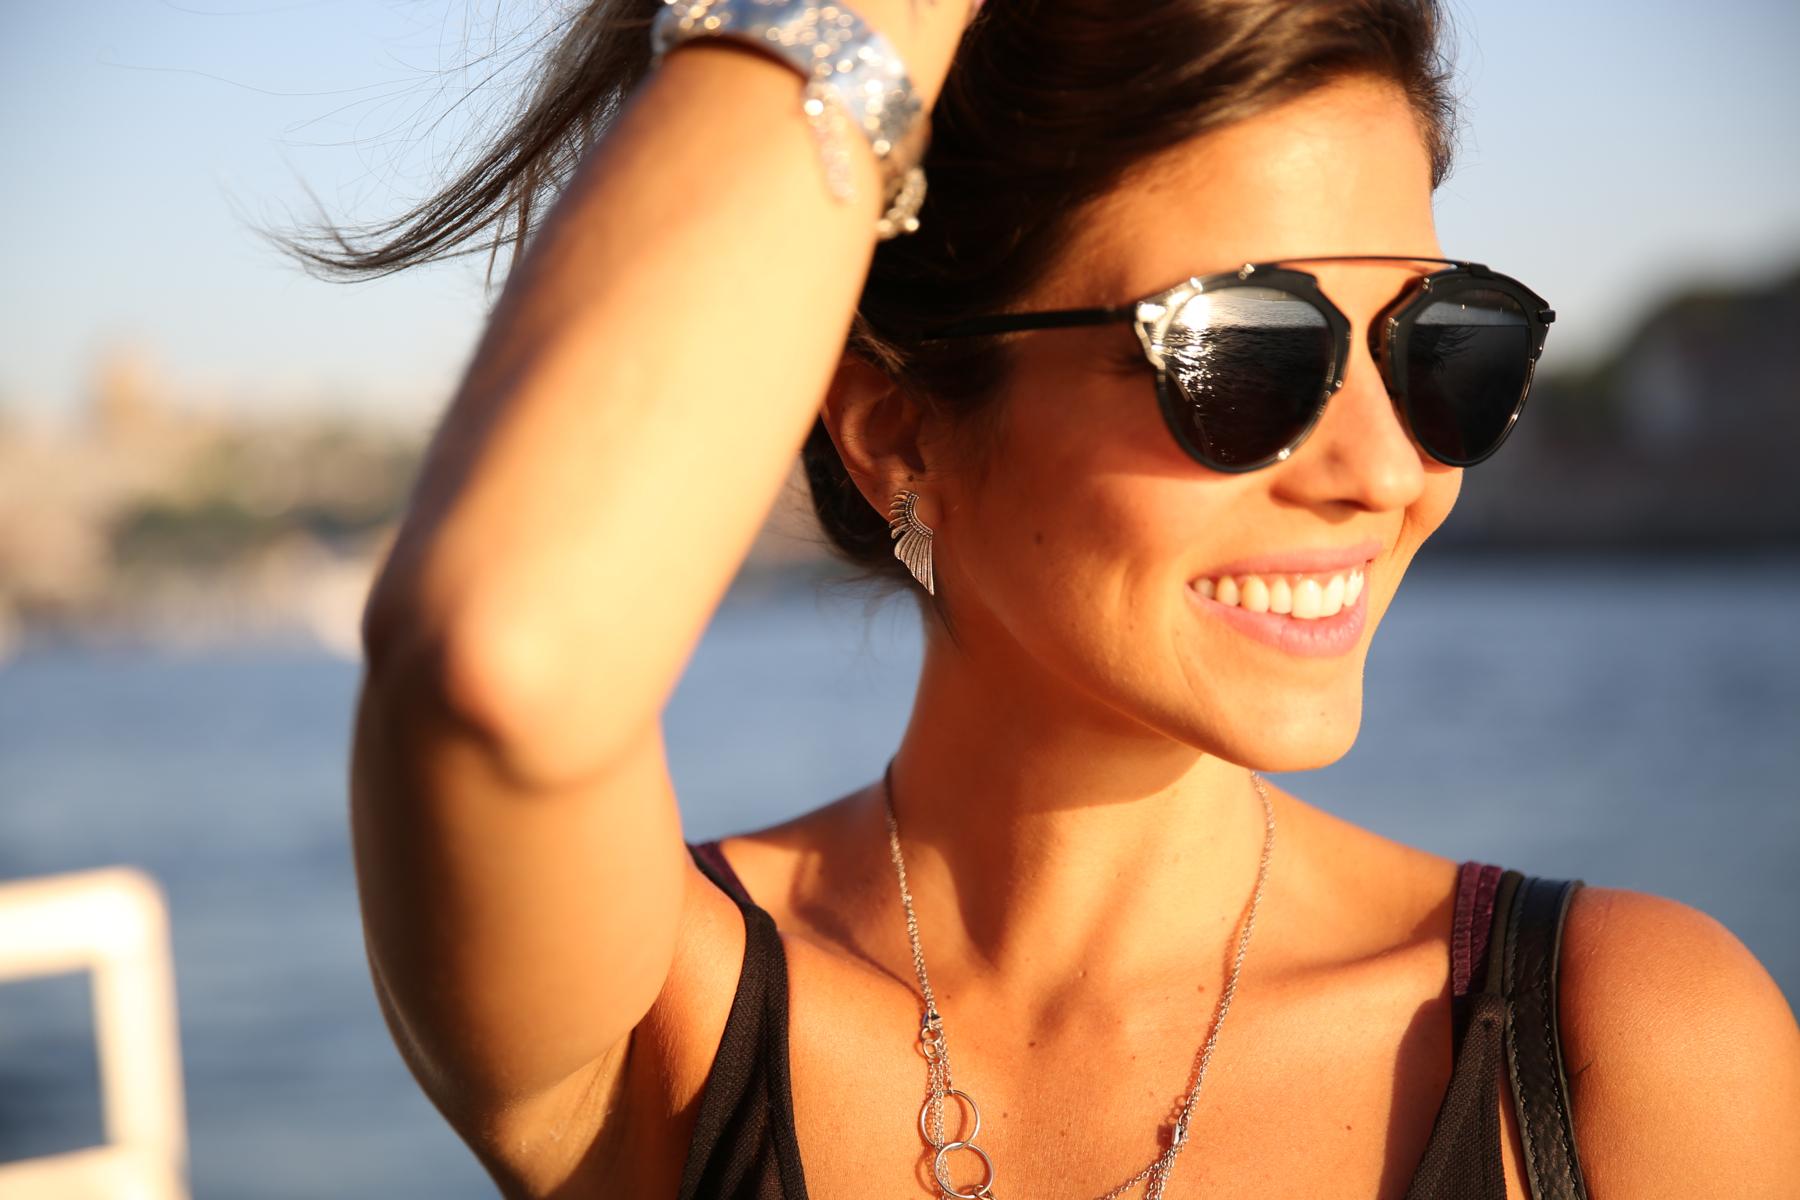 trendy_taste-look-outfit-street_style-ootd-blog-blogger-fashion_spain-moda_españa-salsa_jeans-dior_gafas-bolso_flecos-fringes_bag-khaki_shorts-shorts_caqui-grey_tee-camiseta_gris-verano-porto-portugal-3